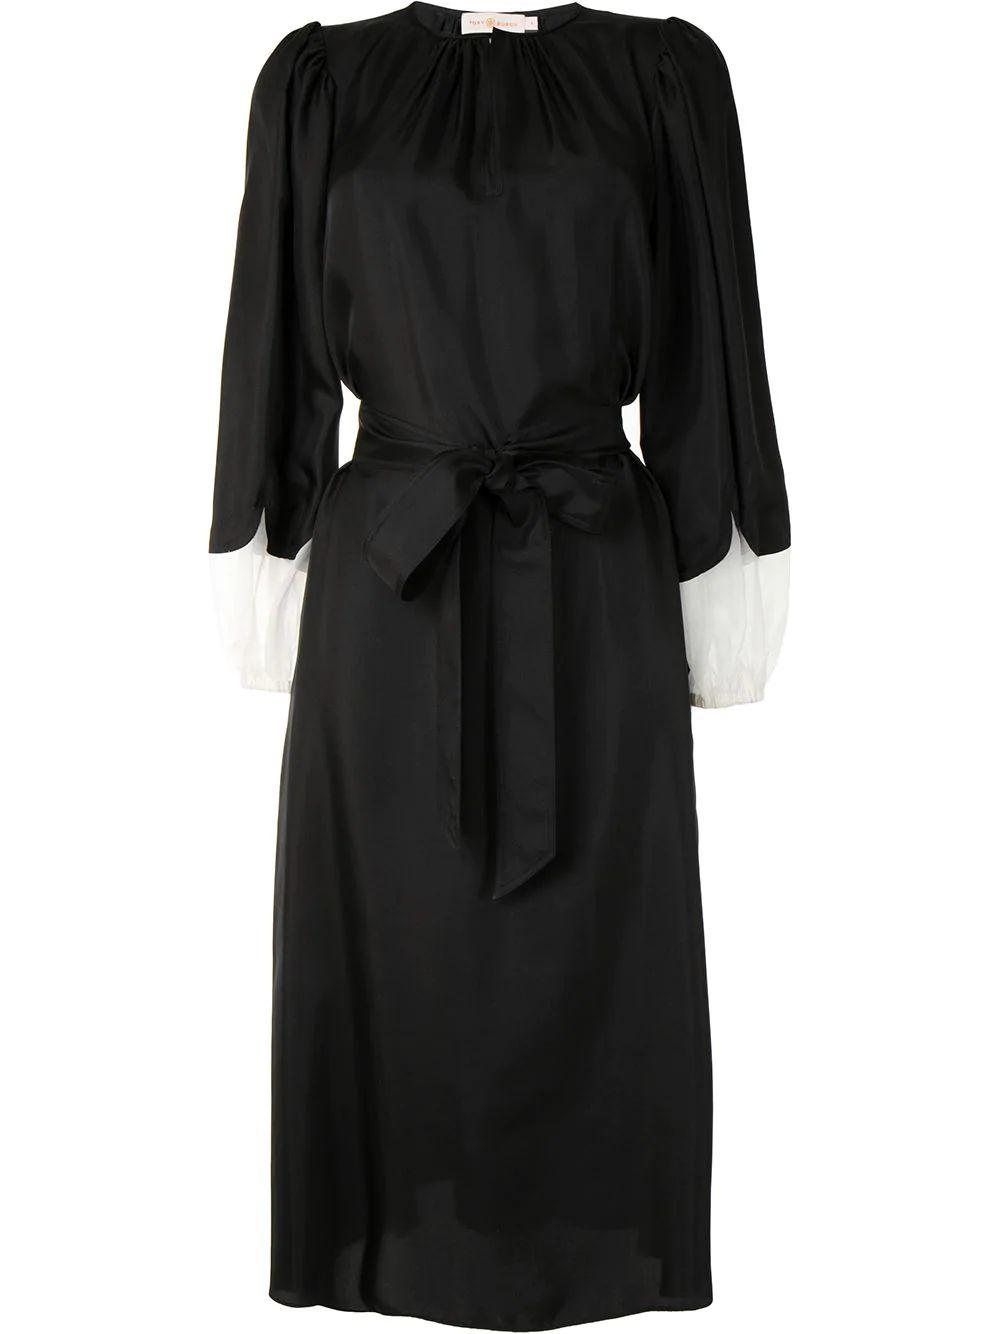 Scalloped Sleeve Dress Item # 76509-001